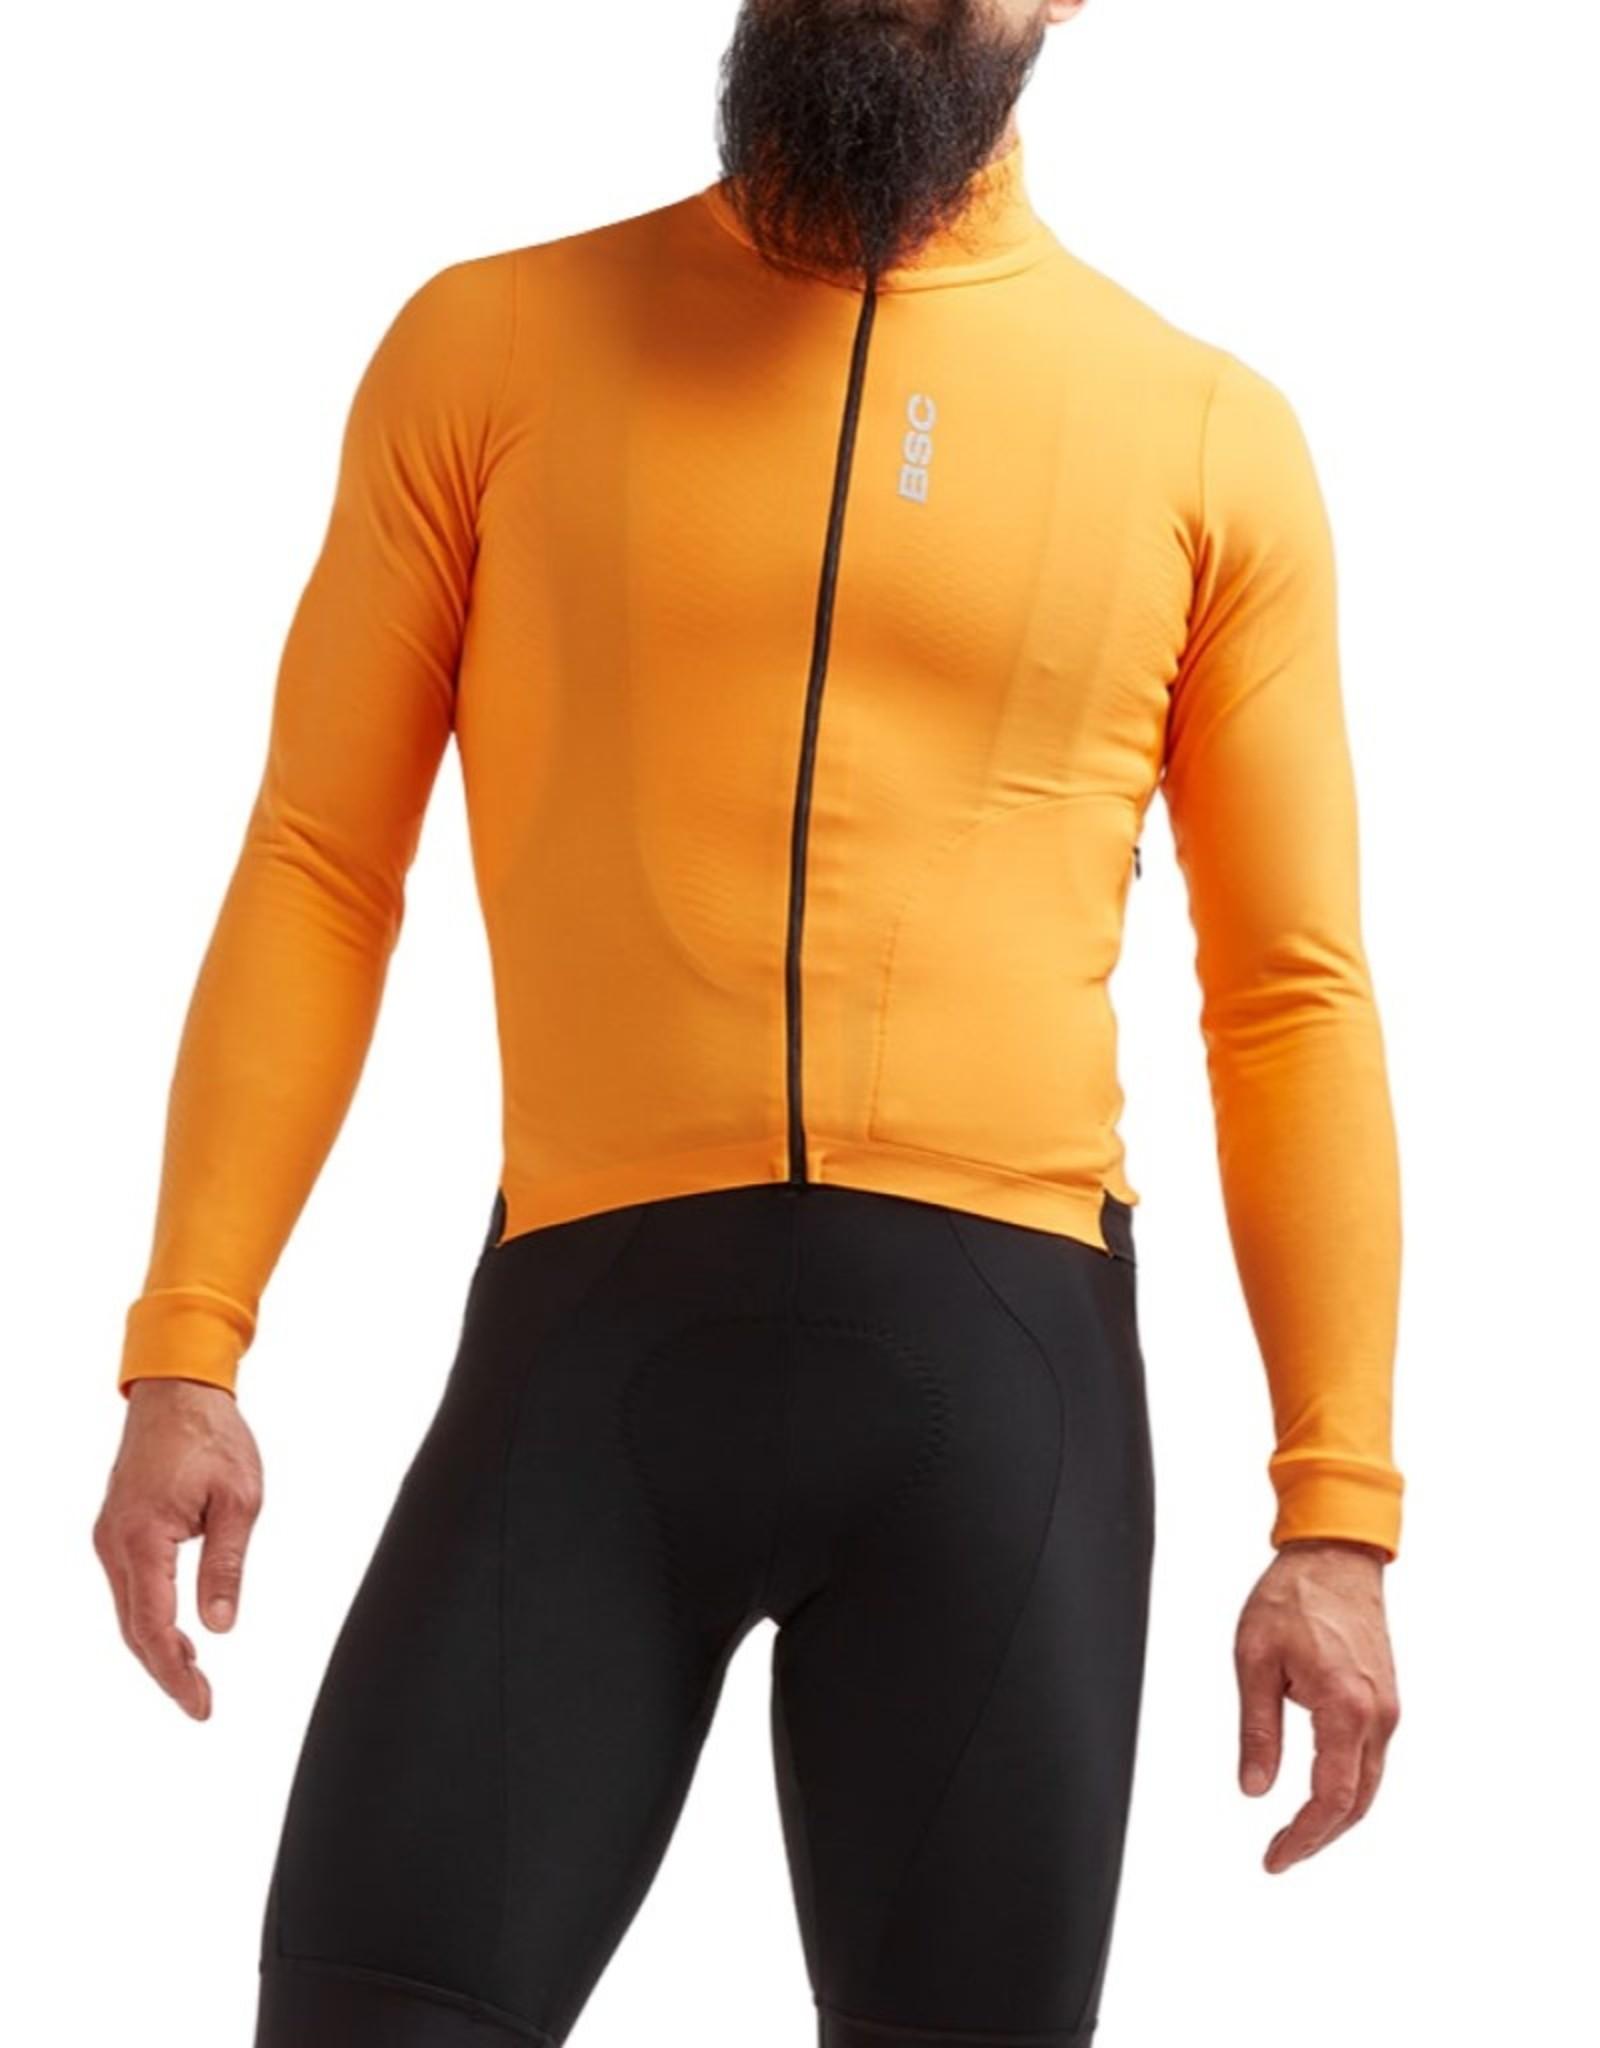 Black Sheep Cycling Men's Elements Thermische fietsjas - Oranje